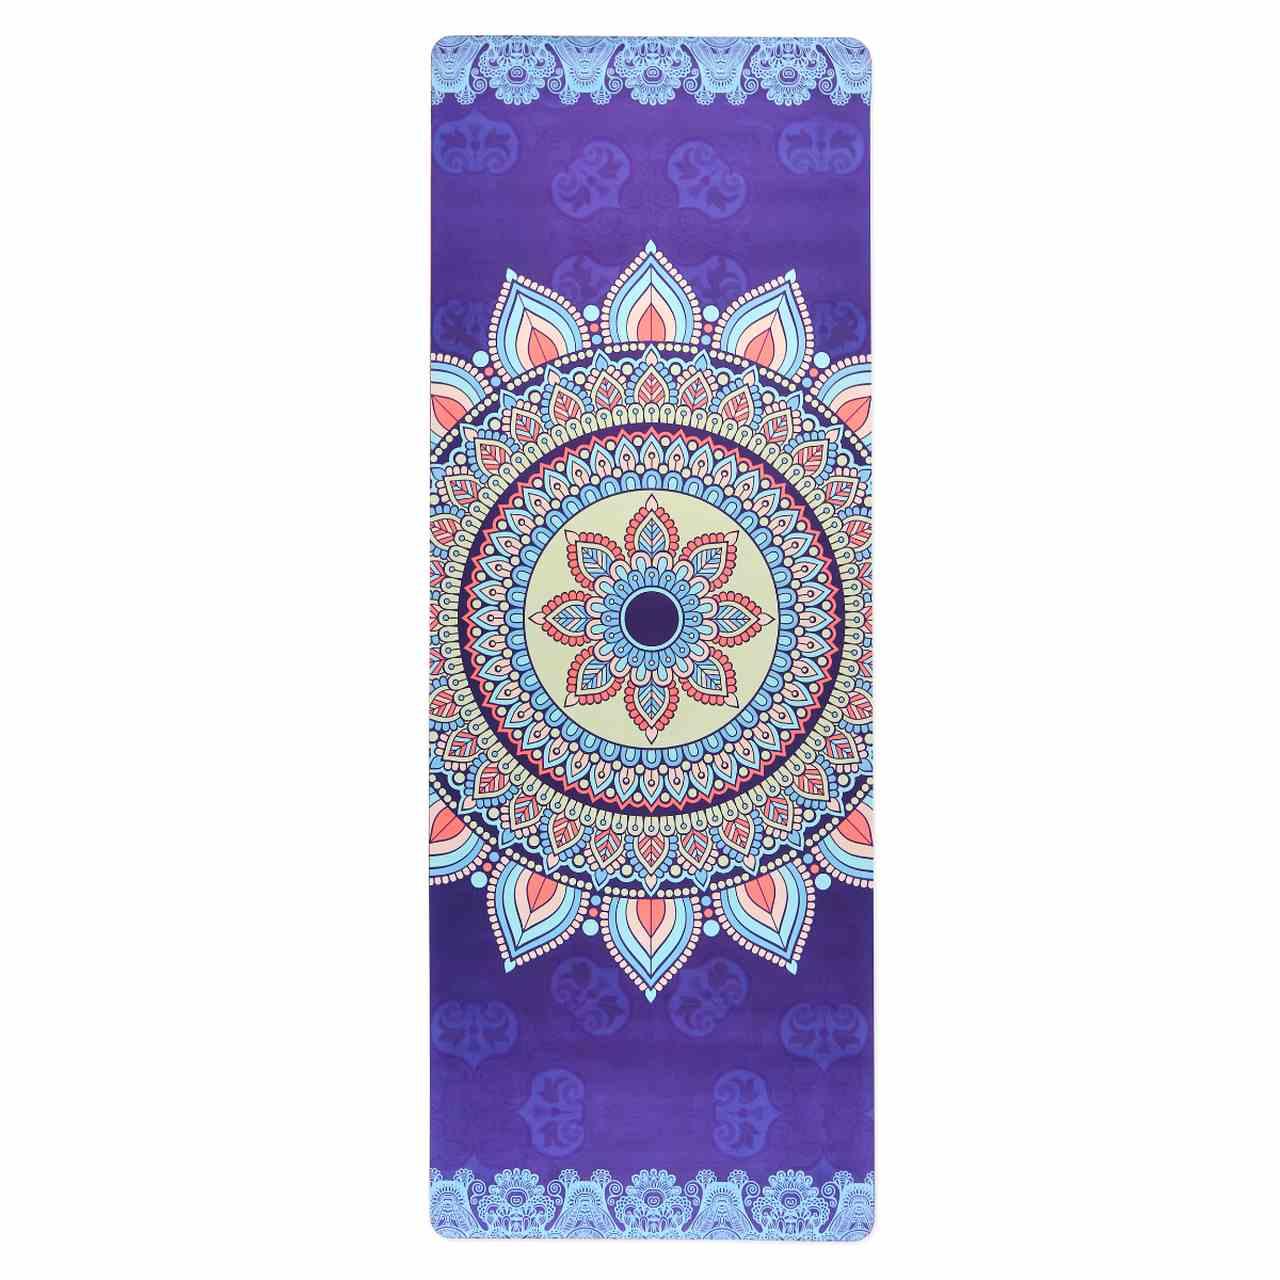 Tapete de Yoga Aveludado com Borracha Natural 183x68cm - Mandala Harmonia